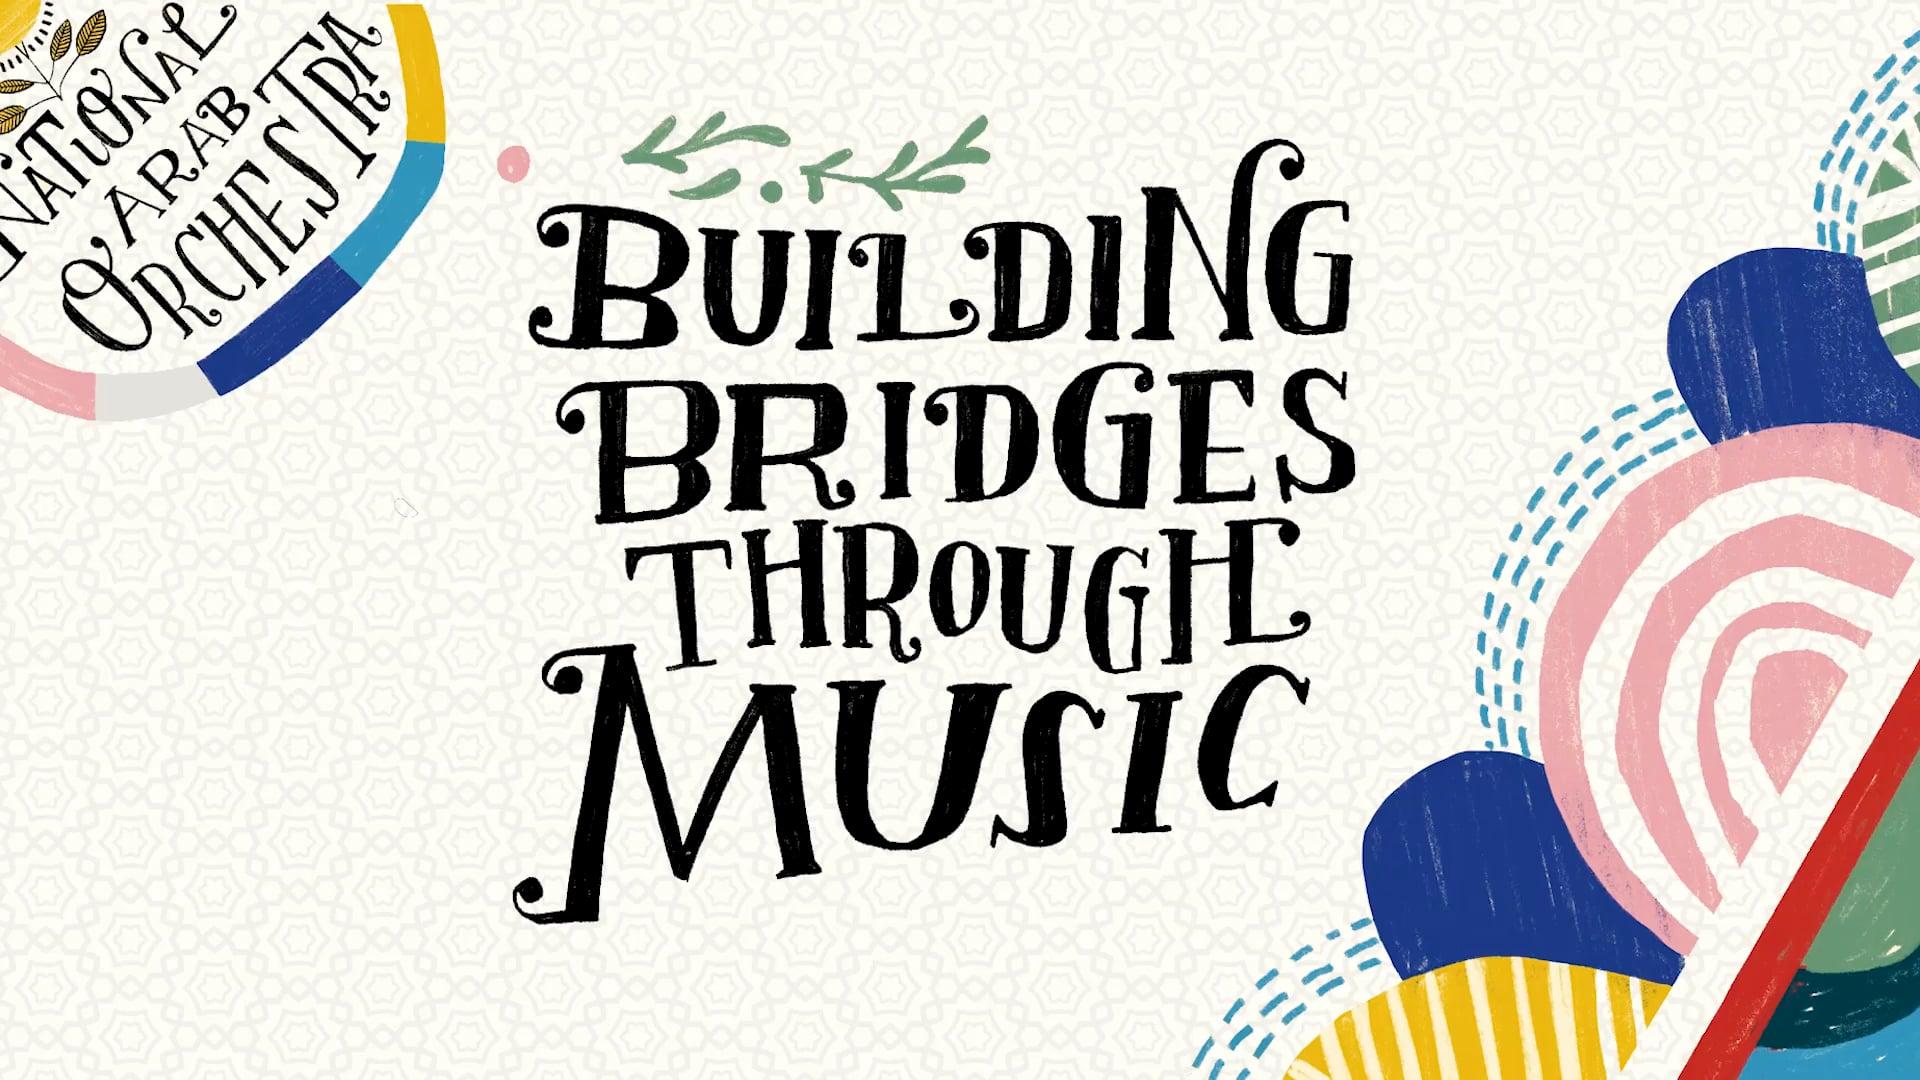 NAO - Building Bridges Through Music 2019